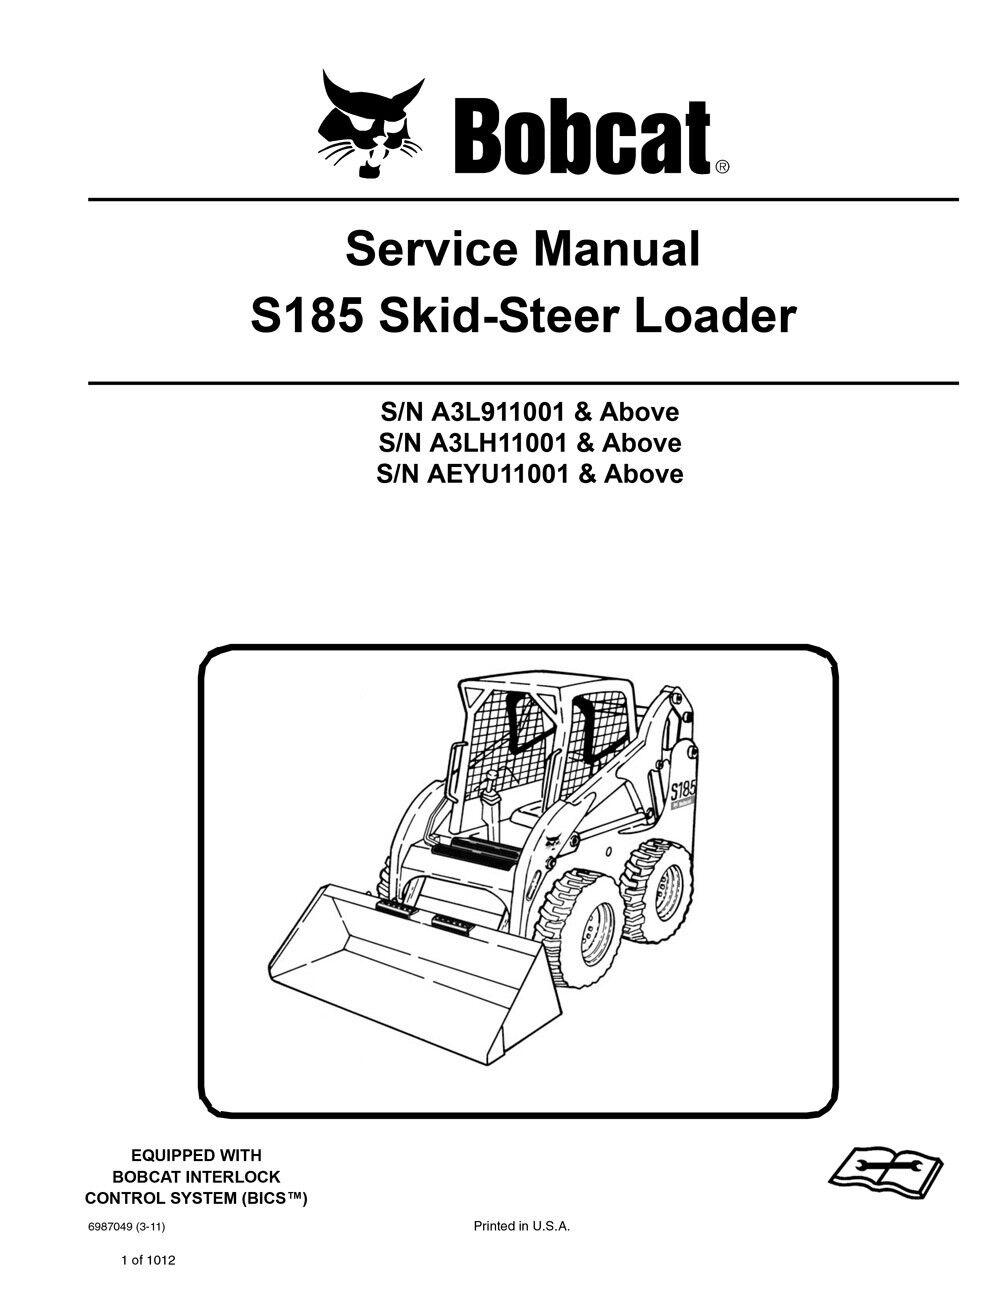 hight resolution of new bobcat s185 skid steer loader 2011 edition service repair manual 6987049 image